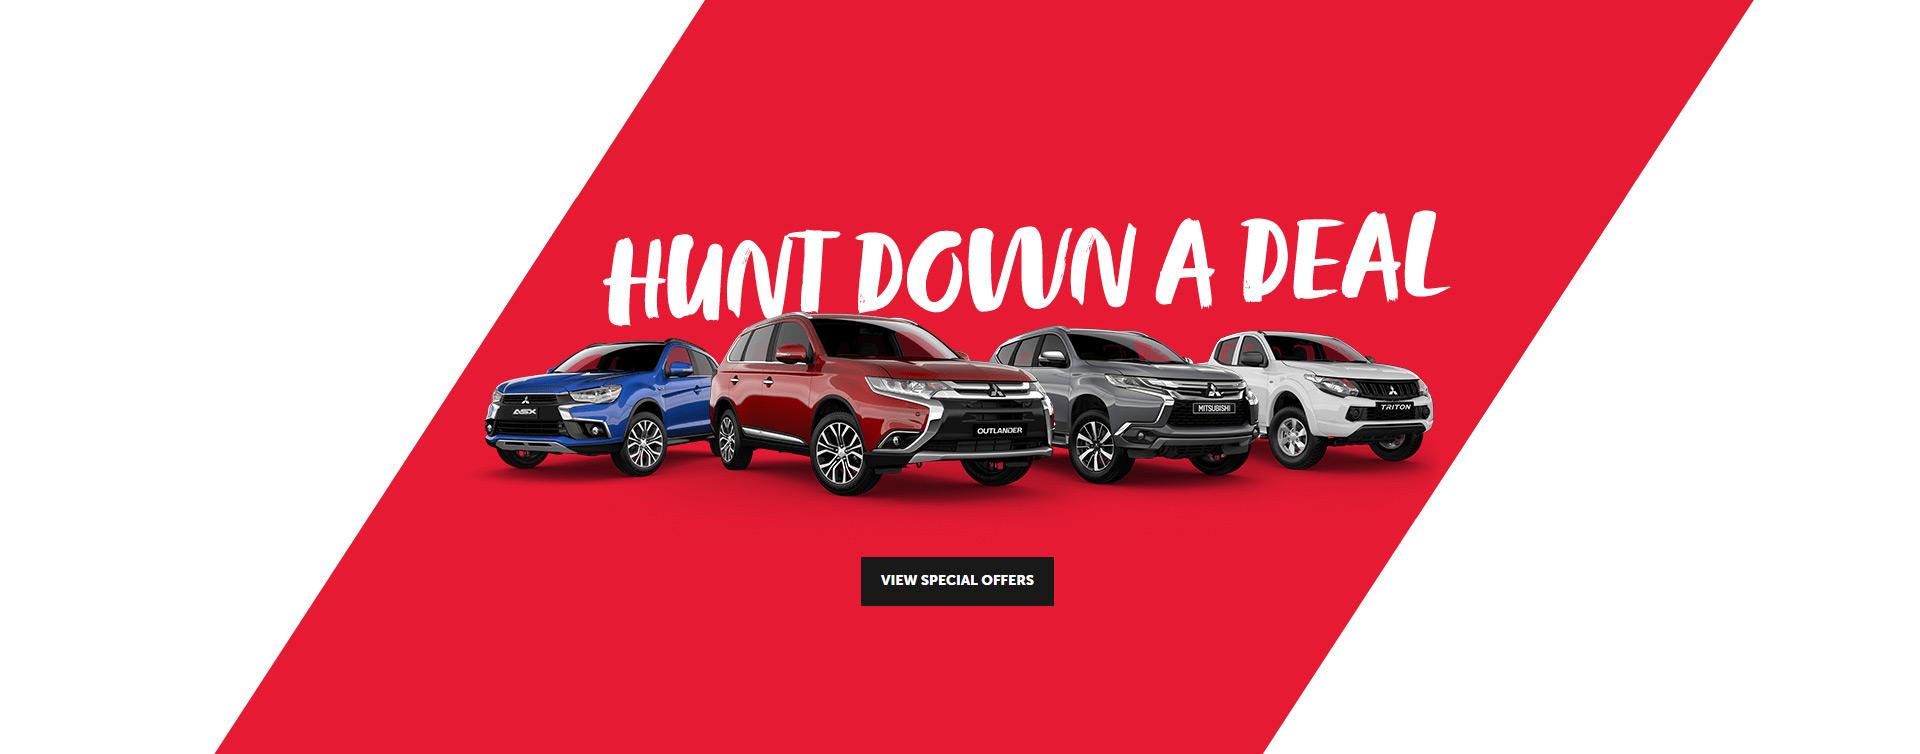 Hunt Down a Deal